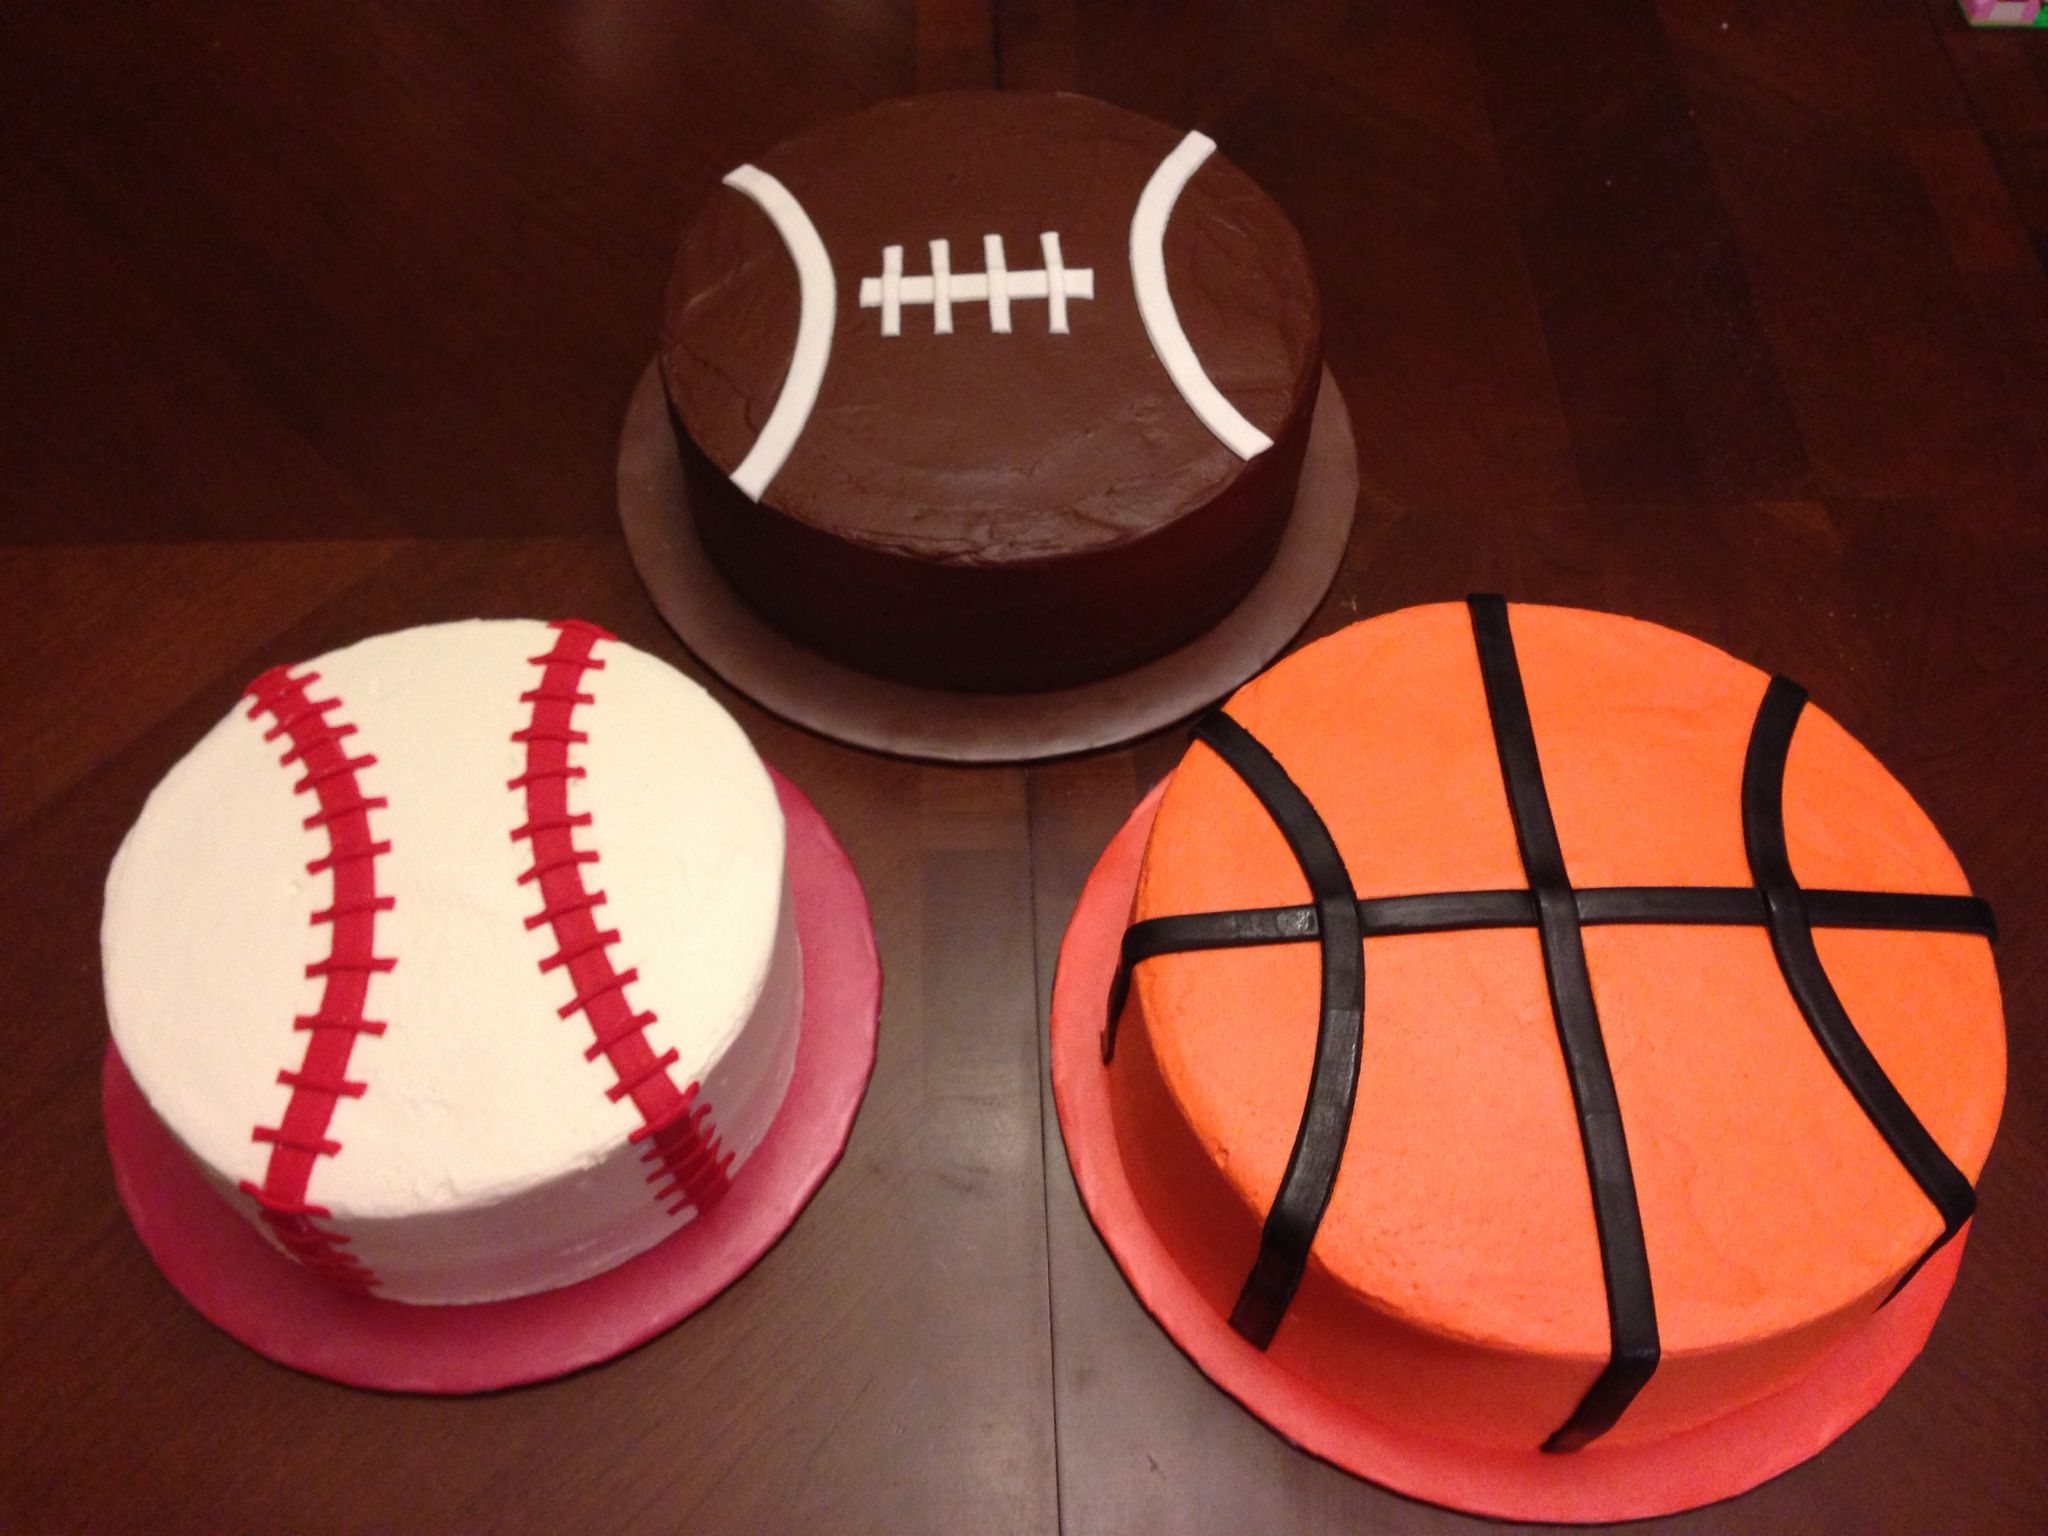 Baseball Football Basketball Cakes With Images Basketball Cake Sports Themed Cakes Boy Birthday Cake